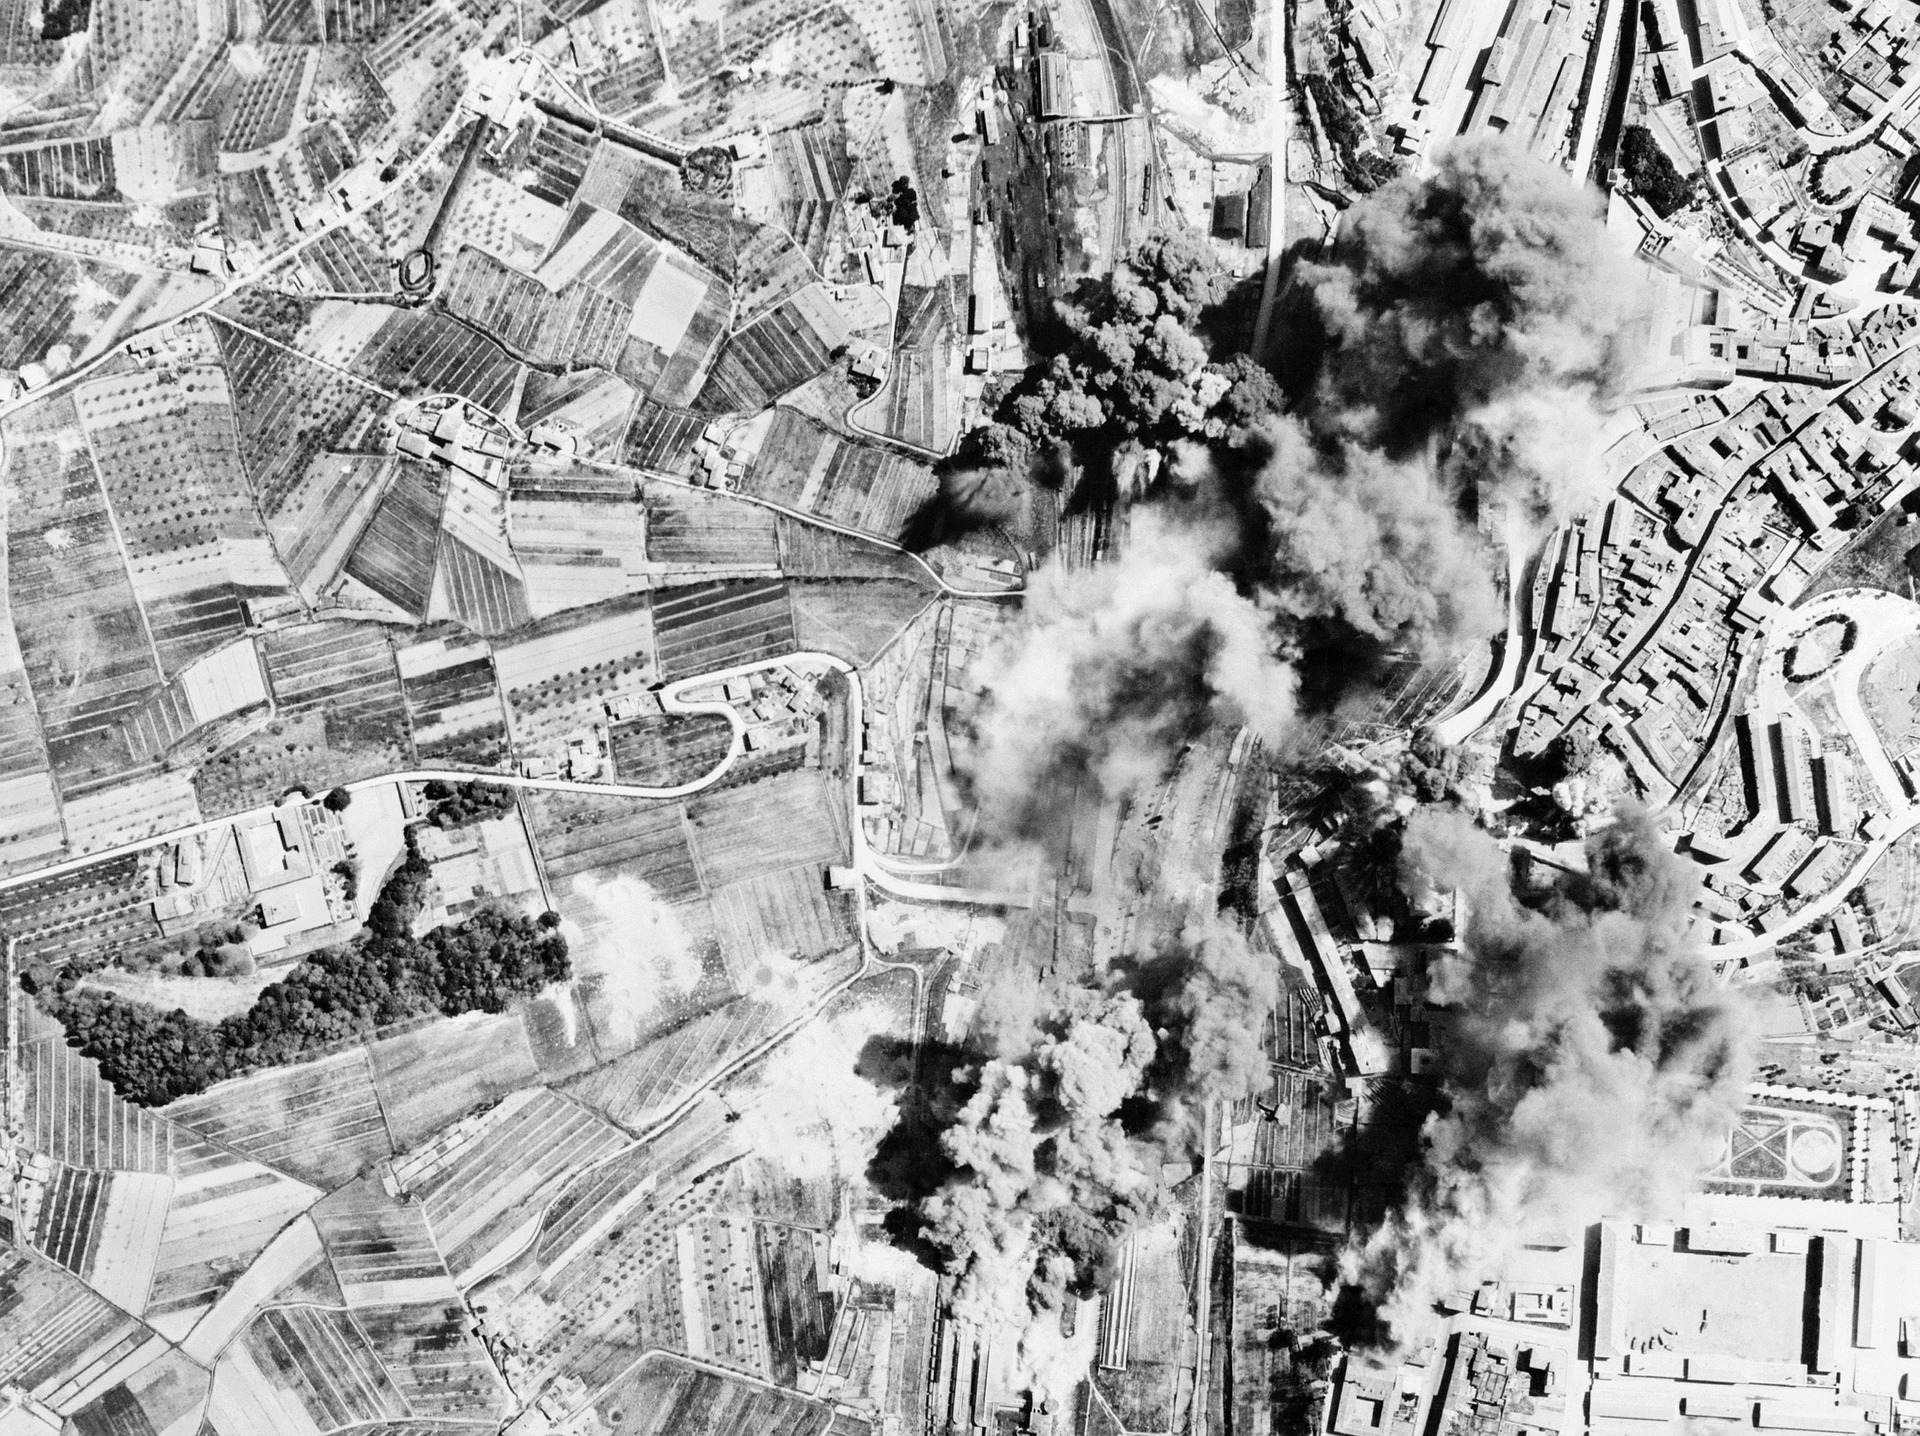 Bombing in Italy 1944